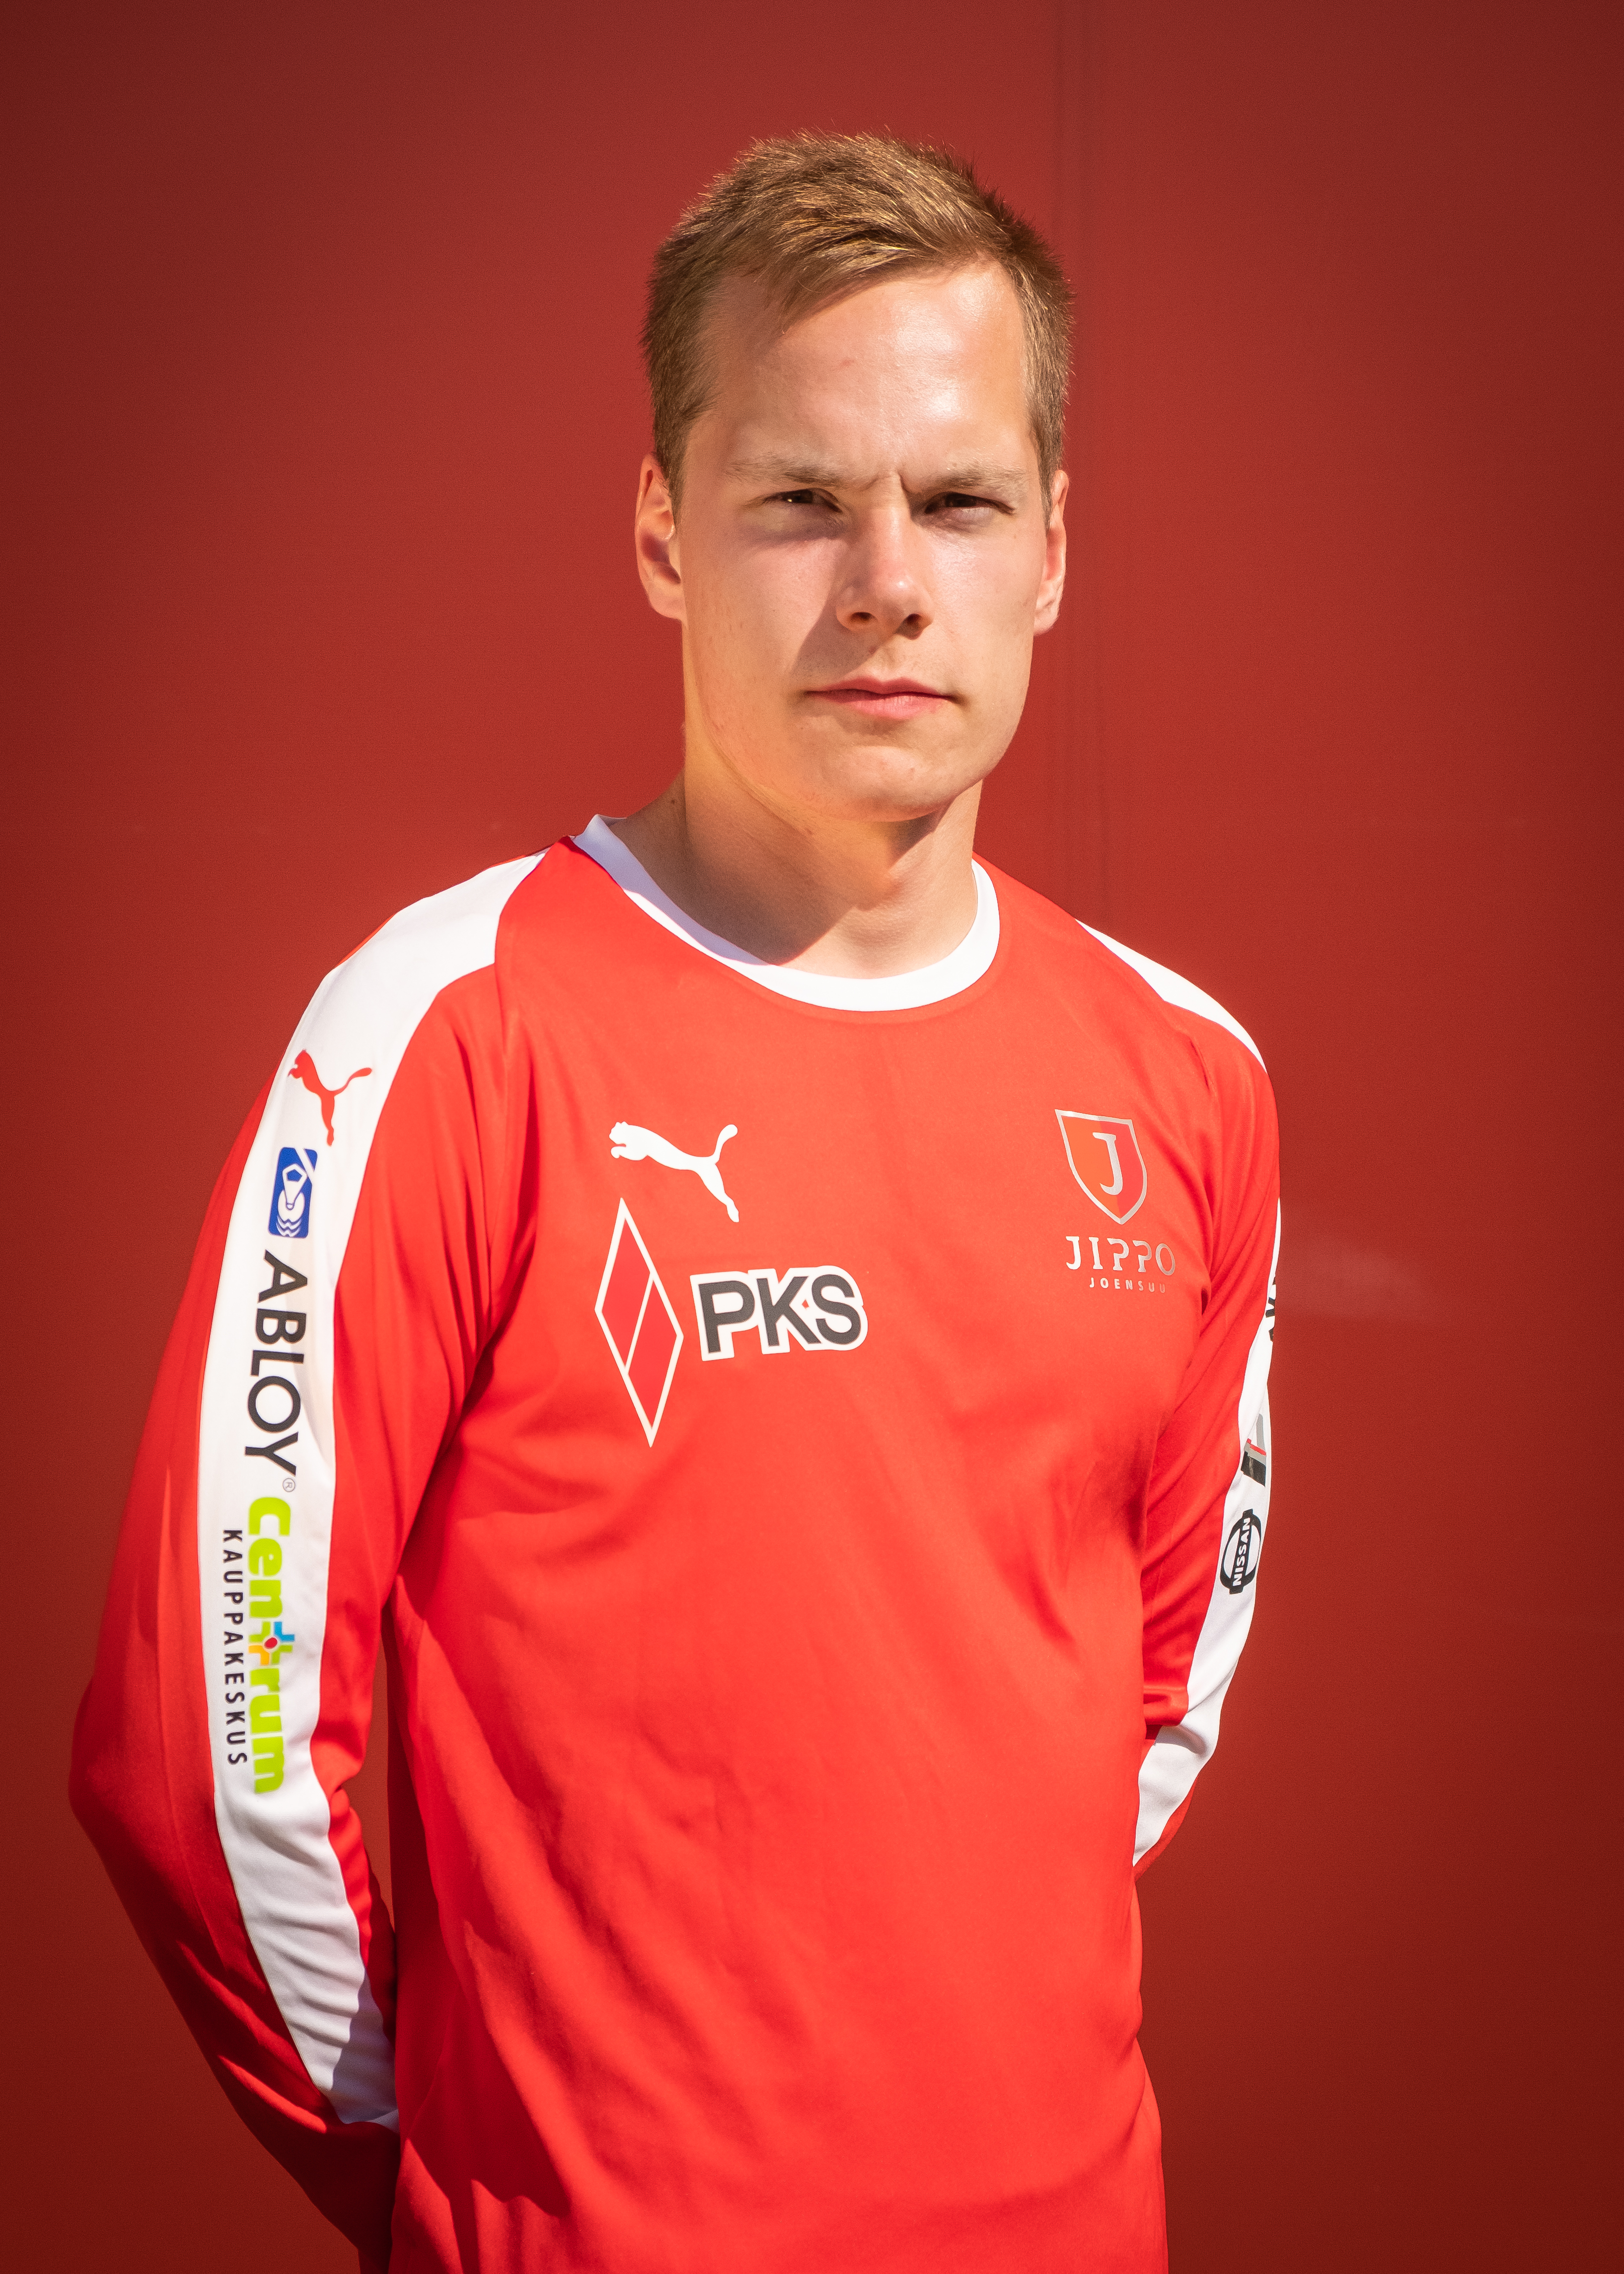 Jussi Tolonen